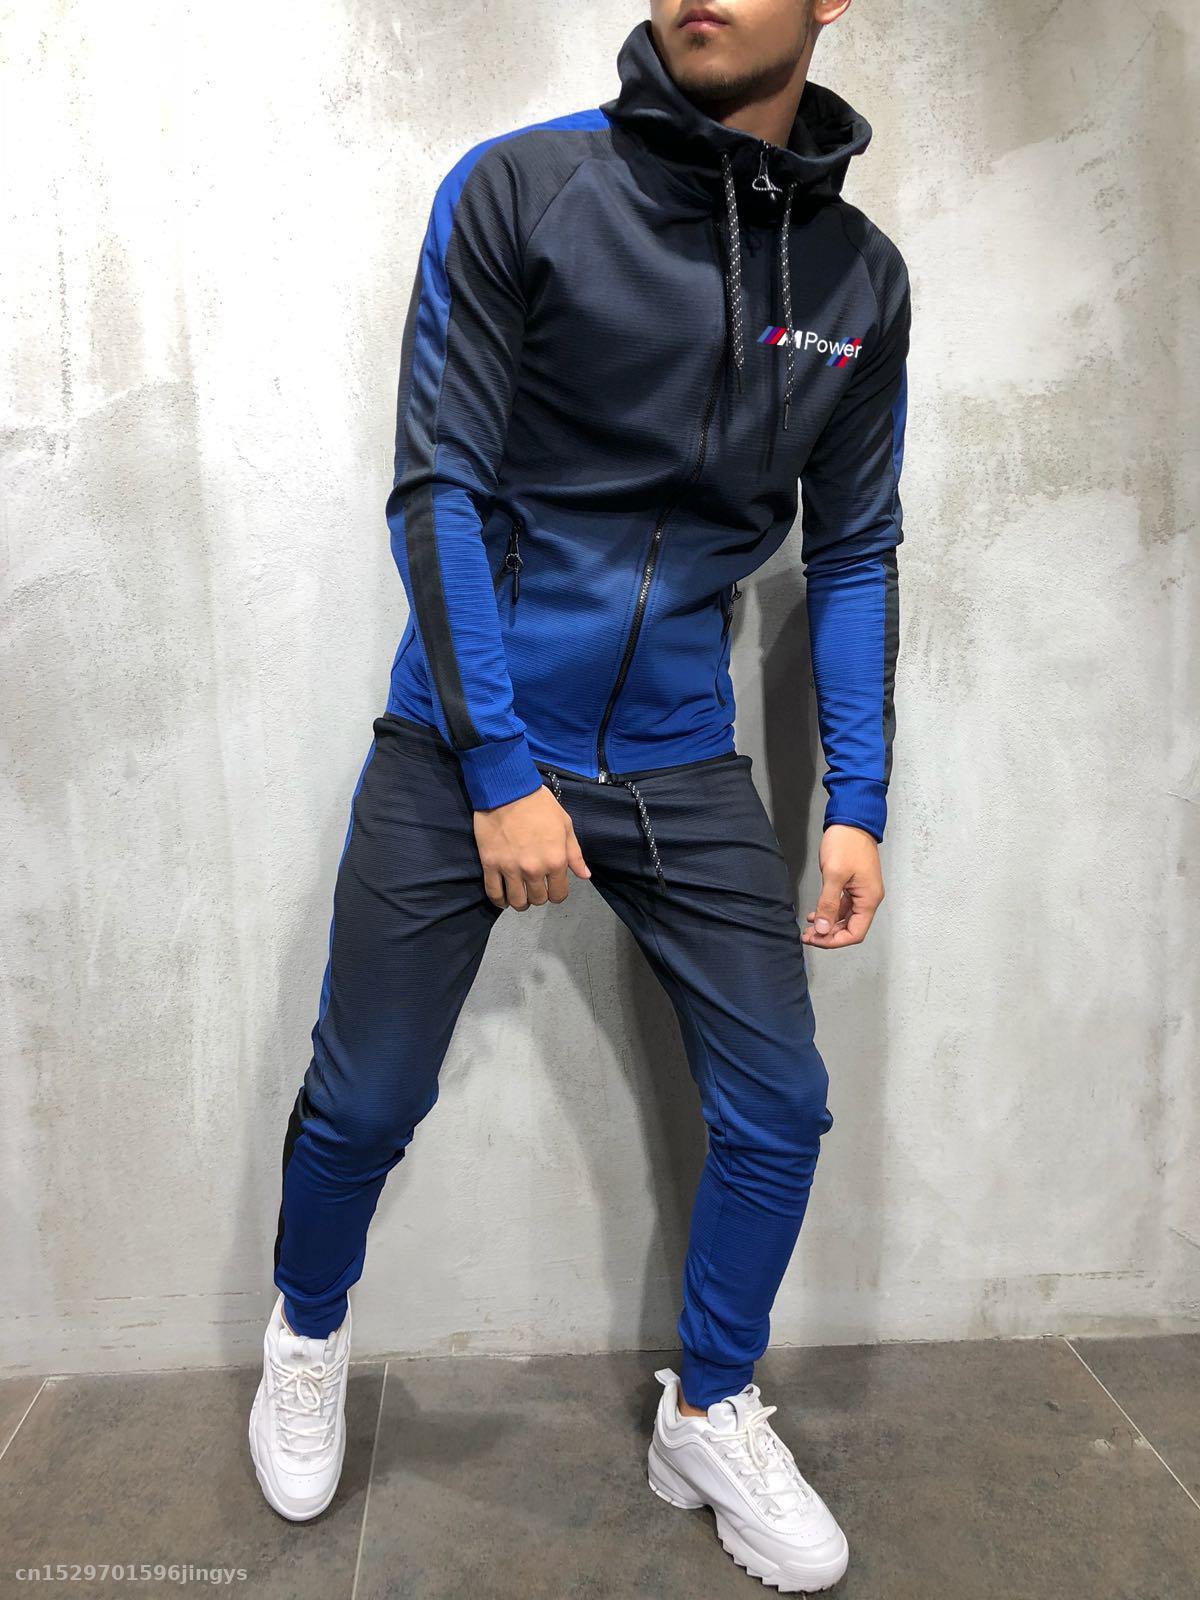 2020 Zipper Tracksuit Men Set Sporting Jacket+Pants 2 Pieces For Bmw M Power Hoodies Sweatshirt &Pant Racing Suit